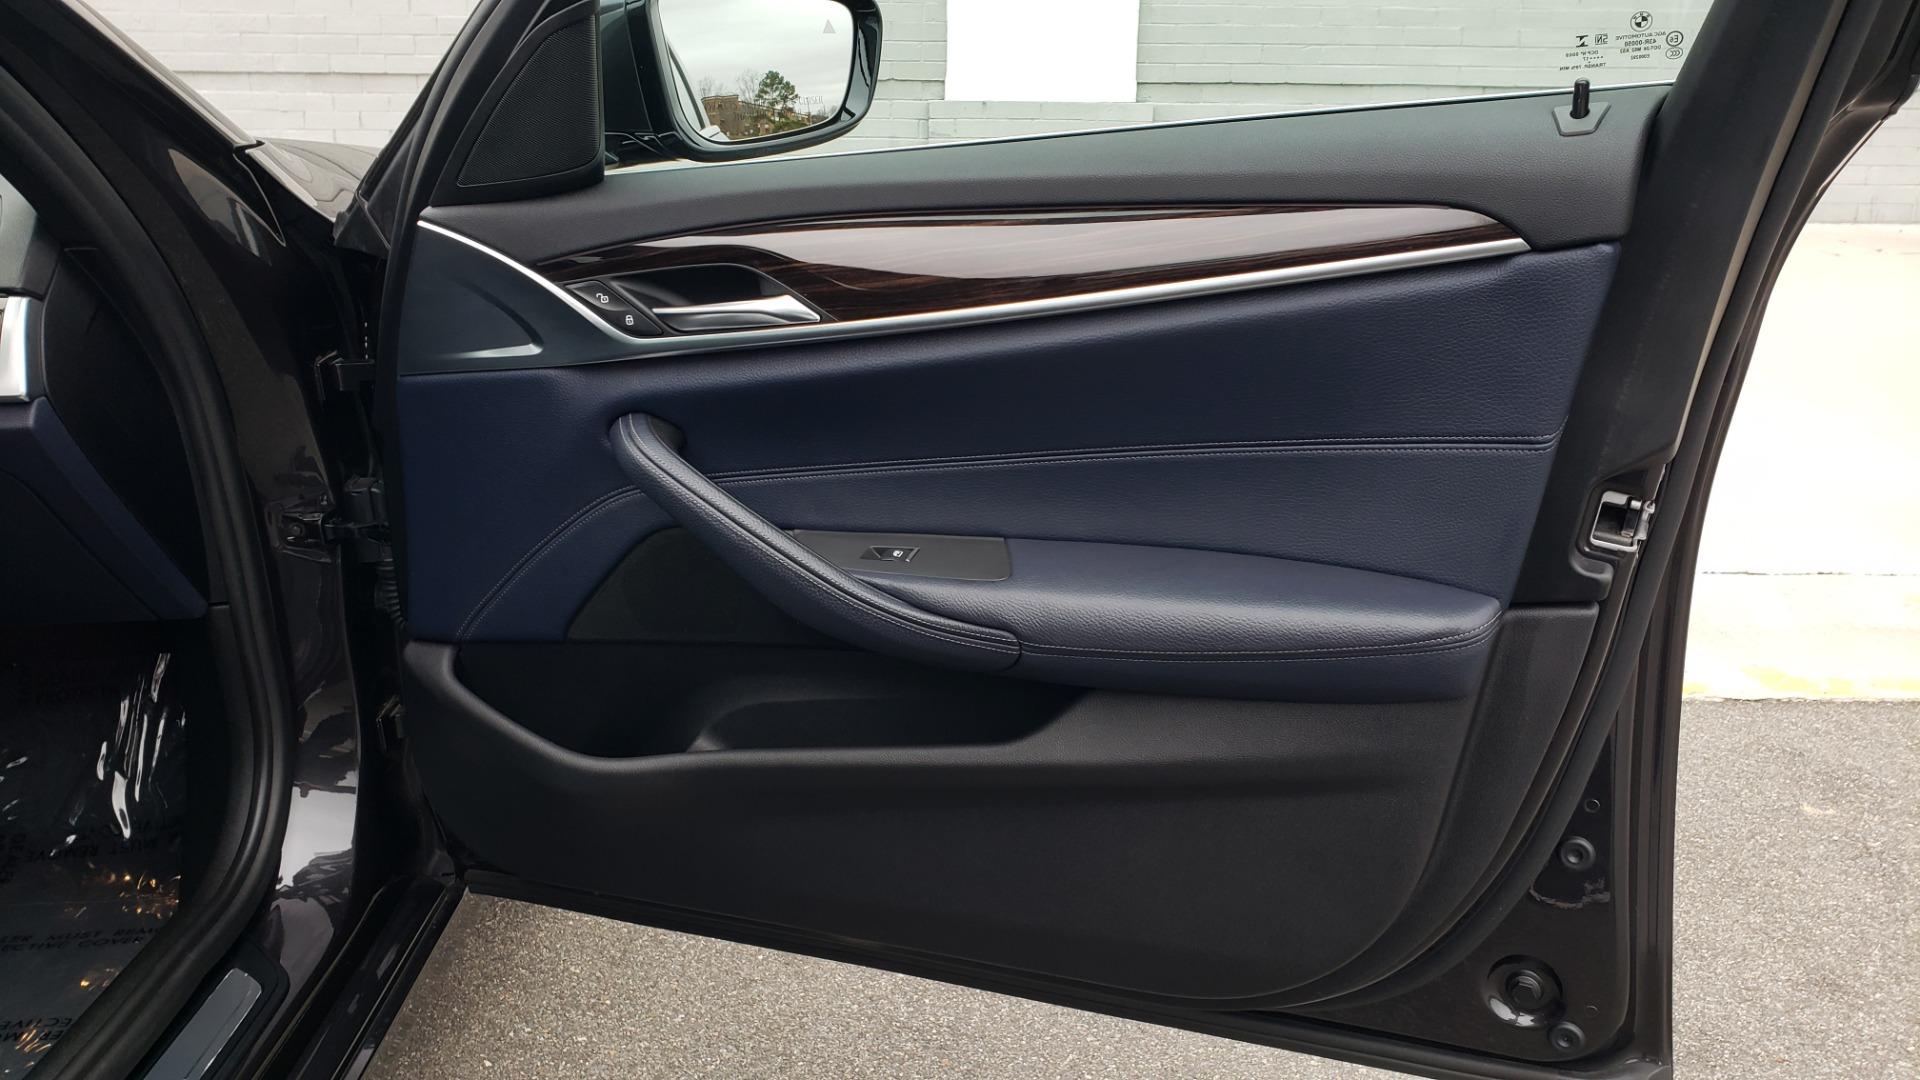 Used 2017 BMW 5 SERIES 530IXDRIVE / PREM PKG / DRVR ASST PLUS / CLD WTHR / APPLE CARPLAY for sale $30,595 at Formula Imports in Charlotte NC 28227 64